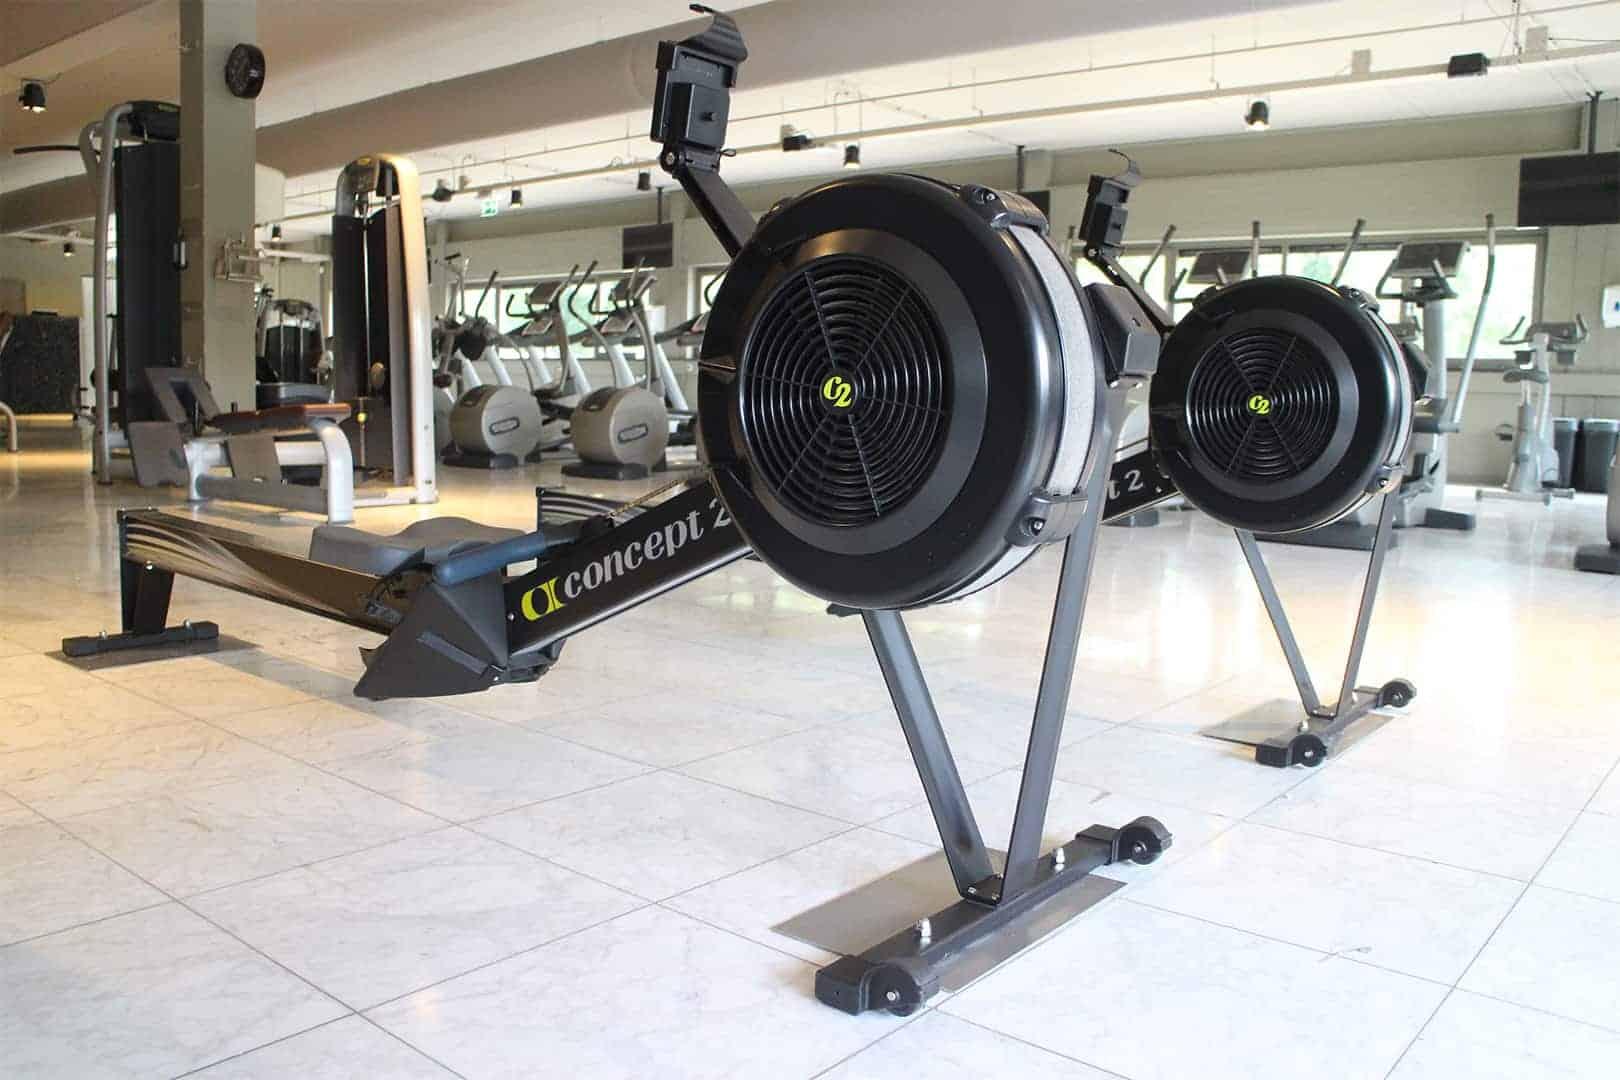 Fitness Studiosport Tubbergen 64